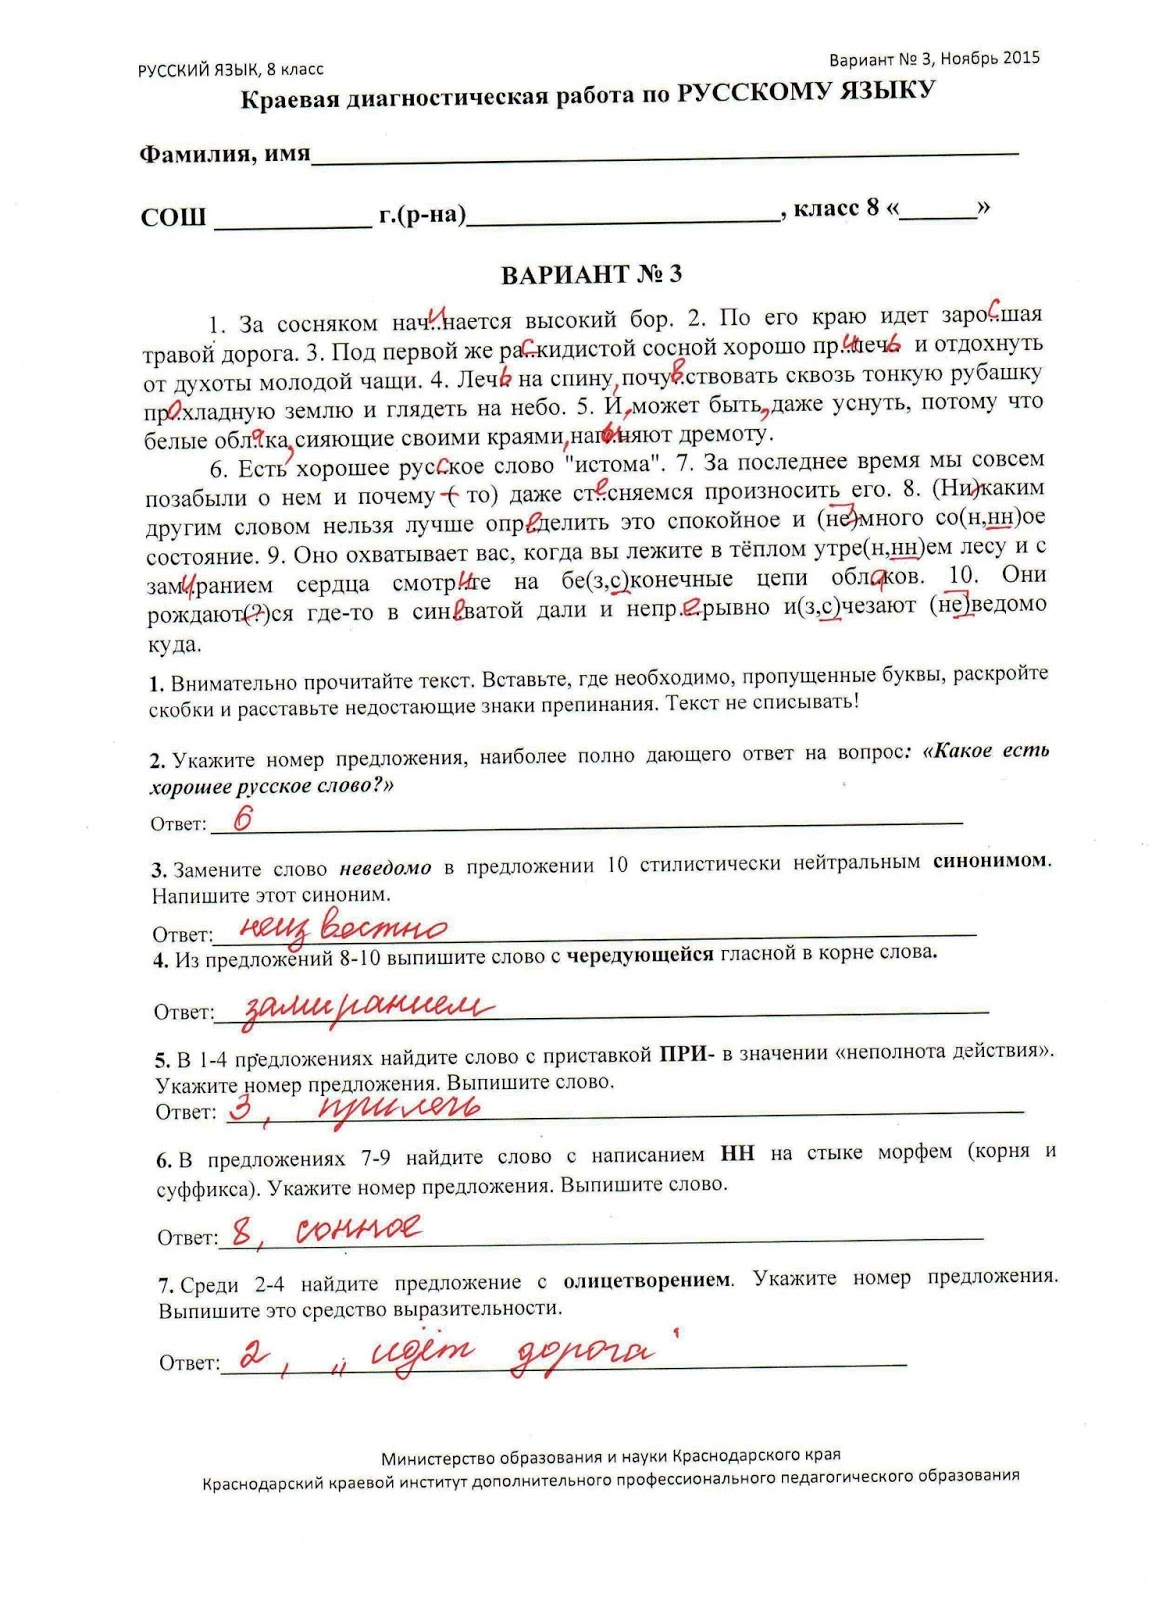 Видеоуроки по русскому языку 8 классе